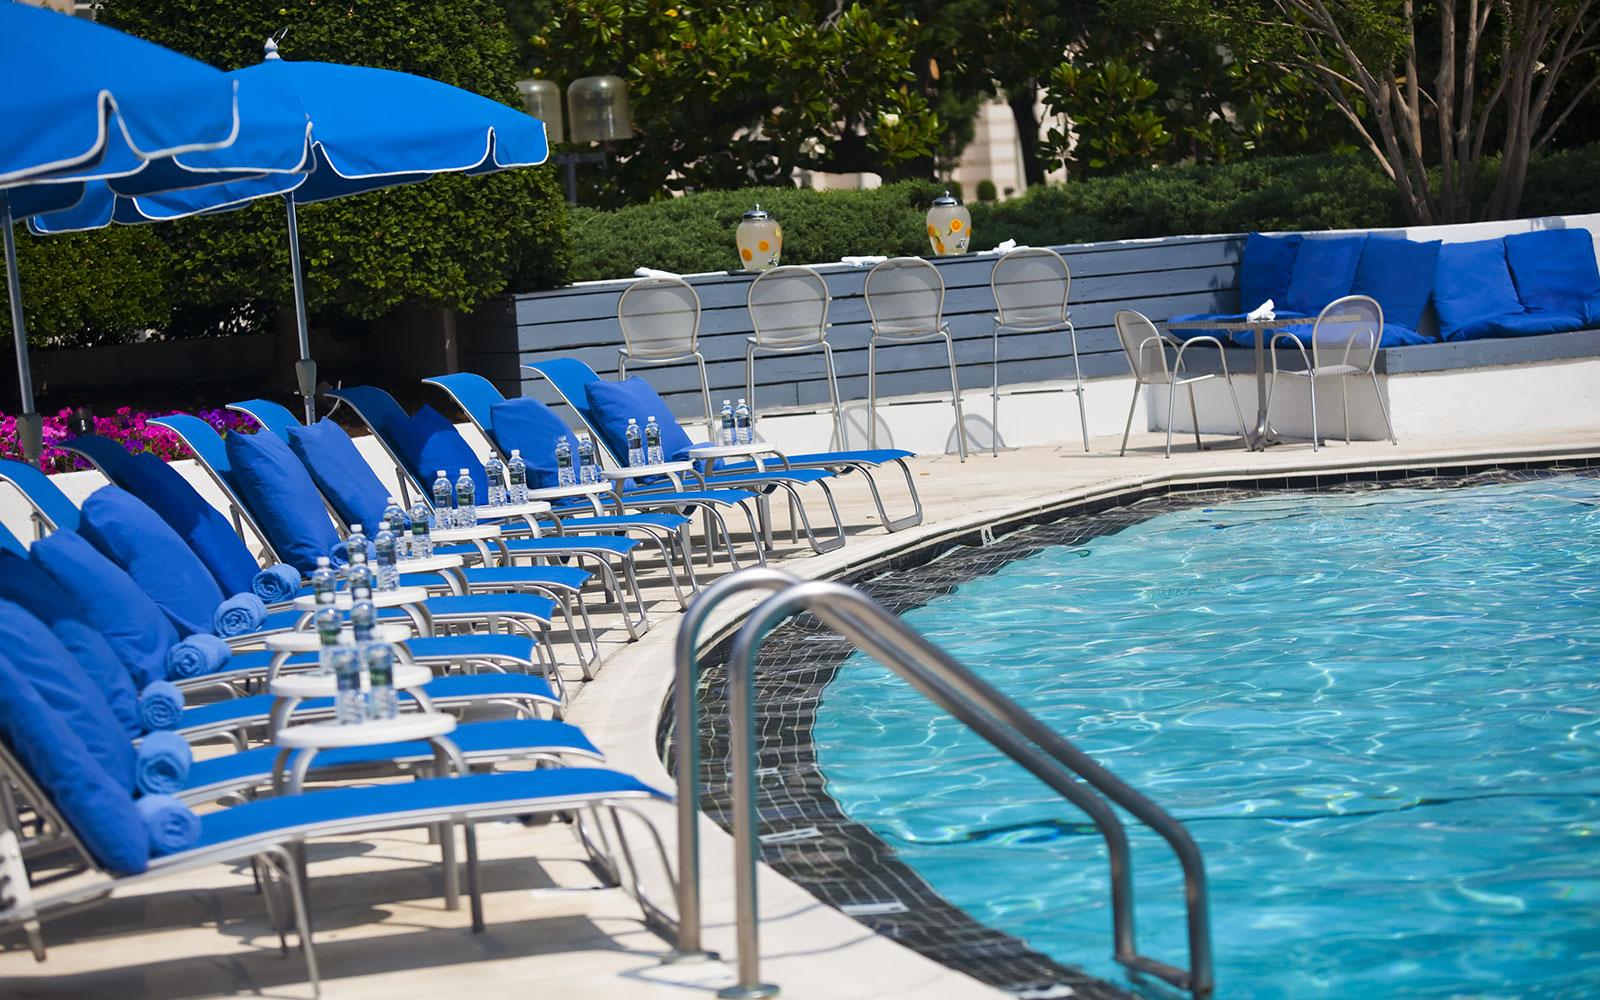 Modern Washington Dc Hotel With A Pool Washington Plaza